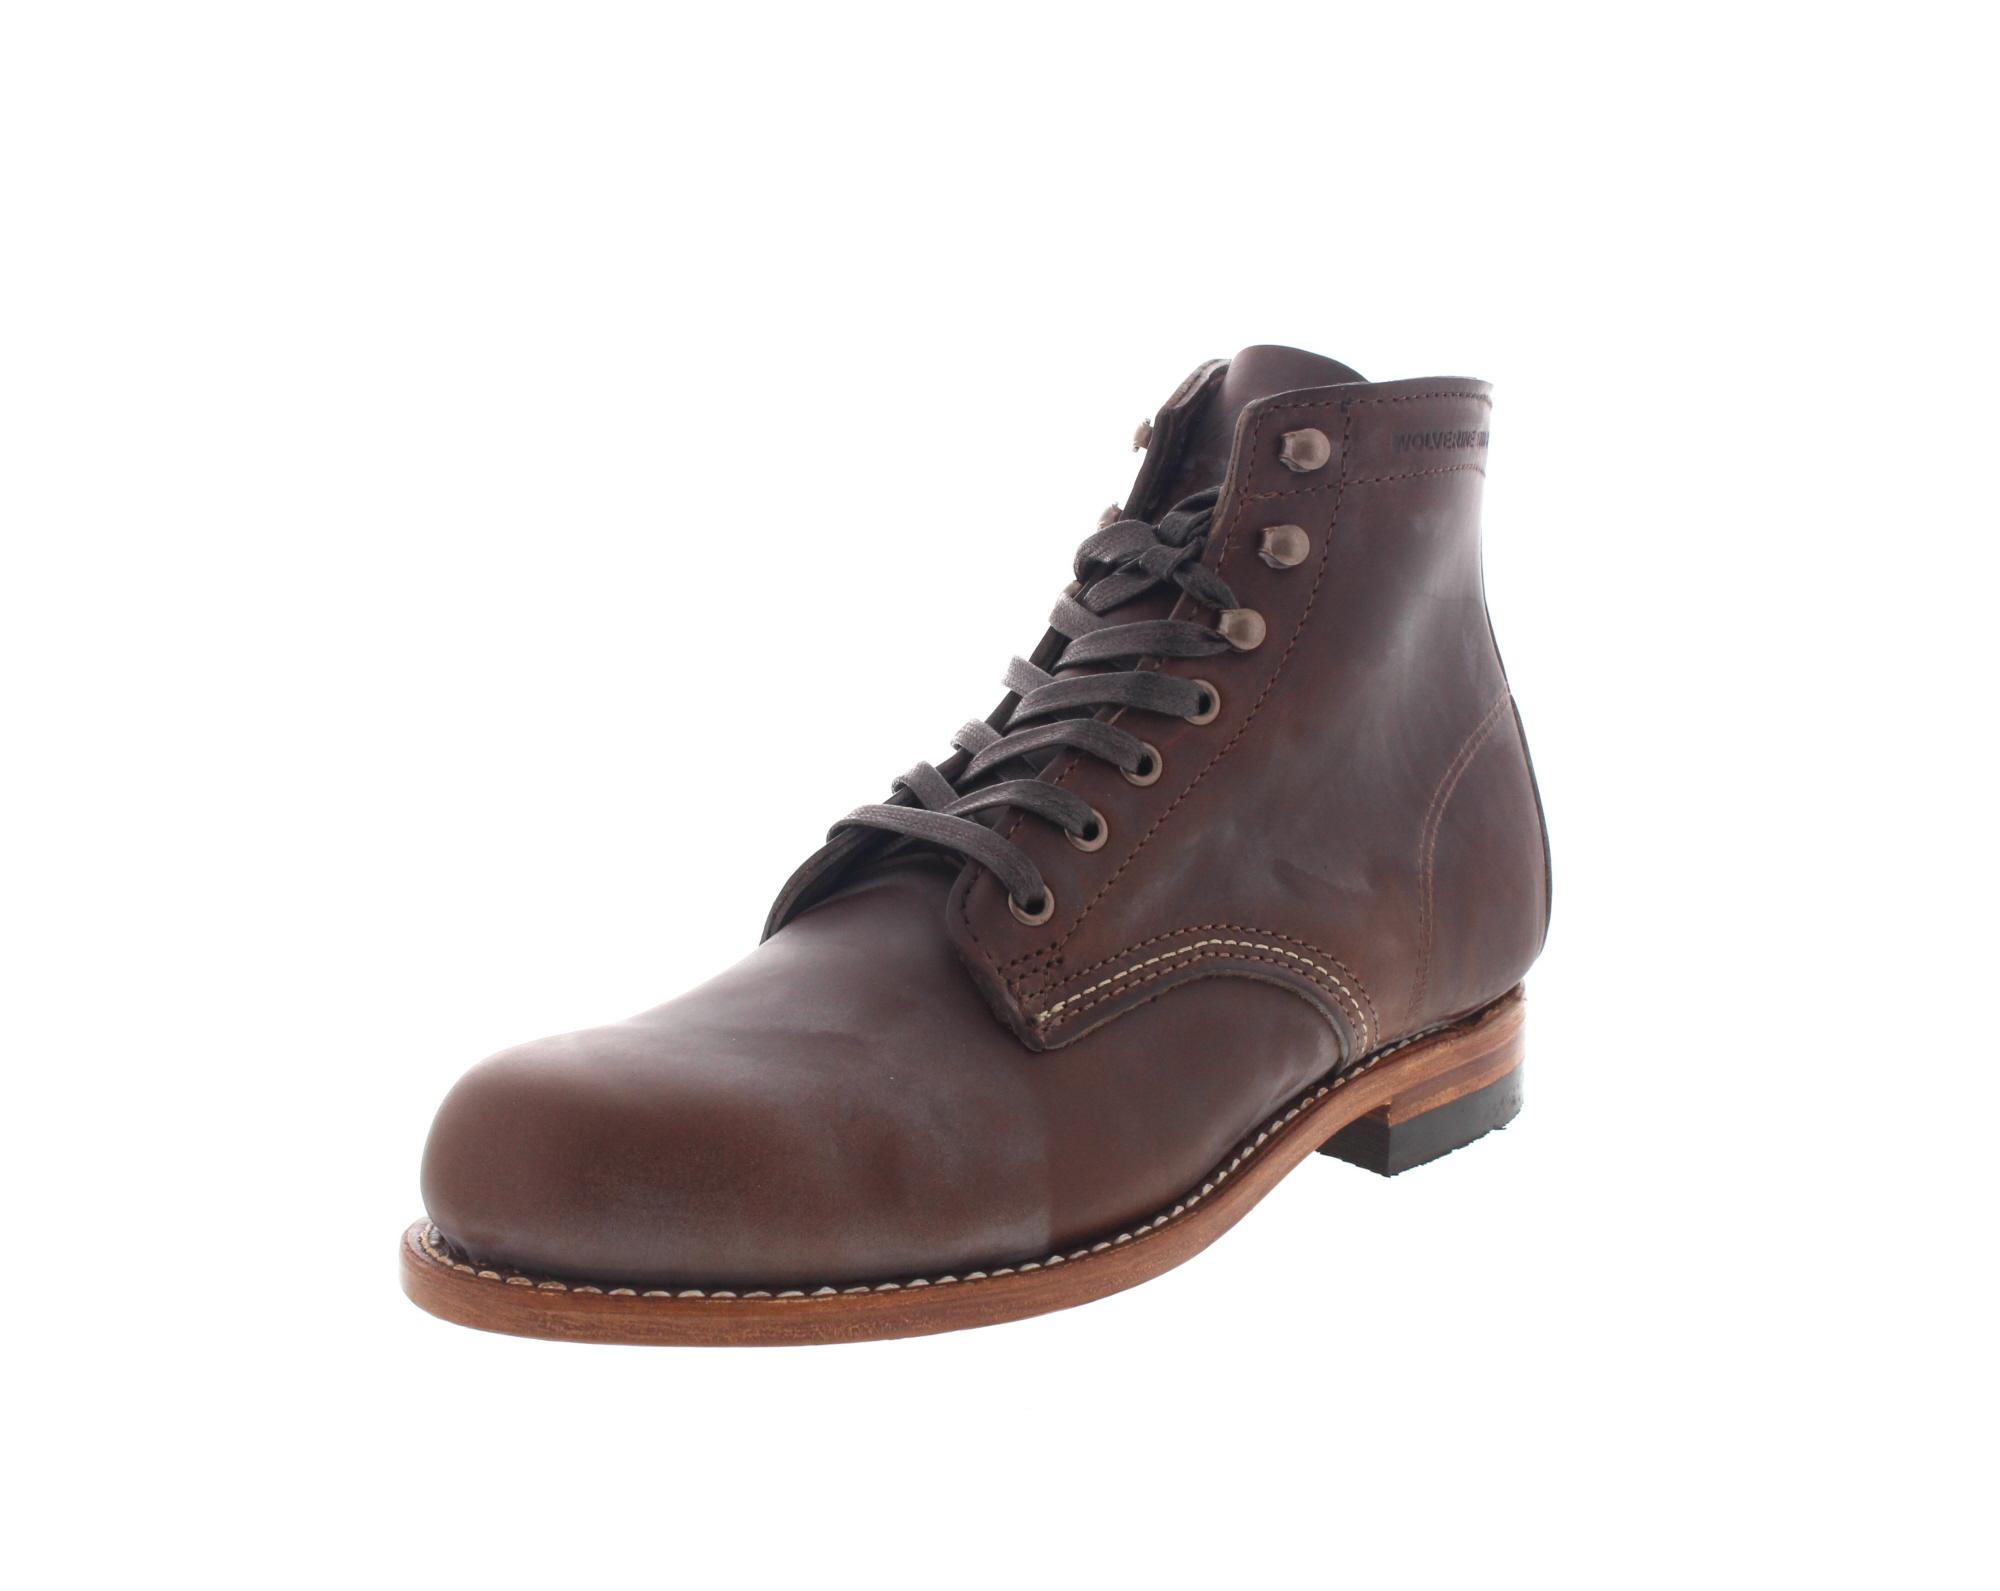 WOLVERINE 1000 Mile - Premium-Boots 1000 Mile - brown-0